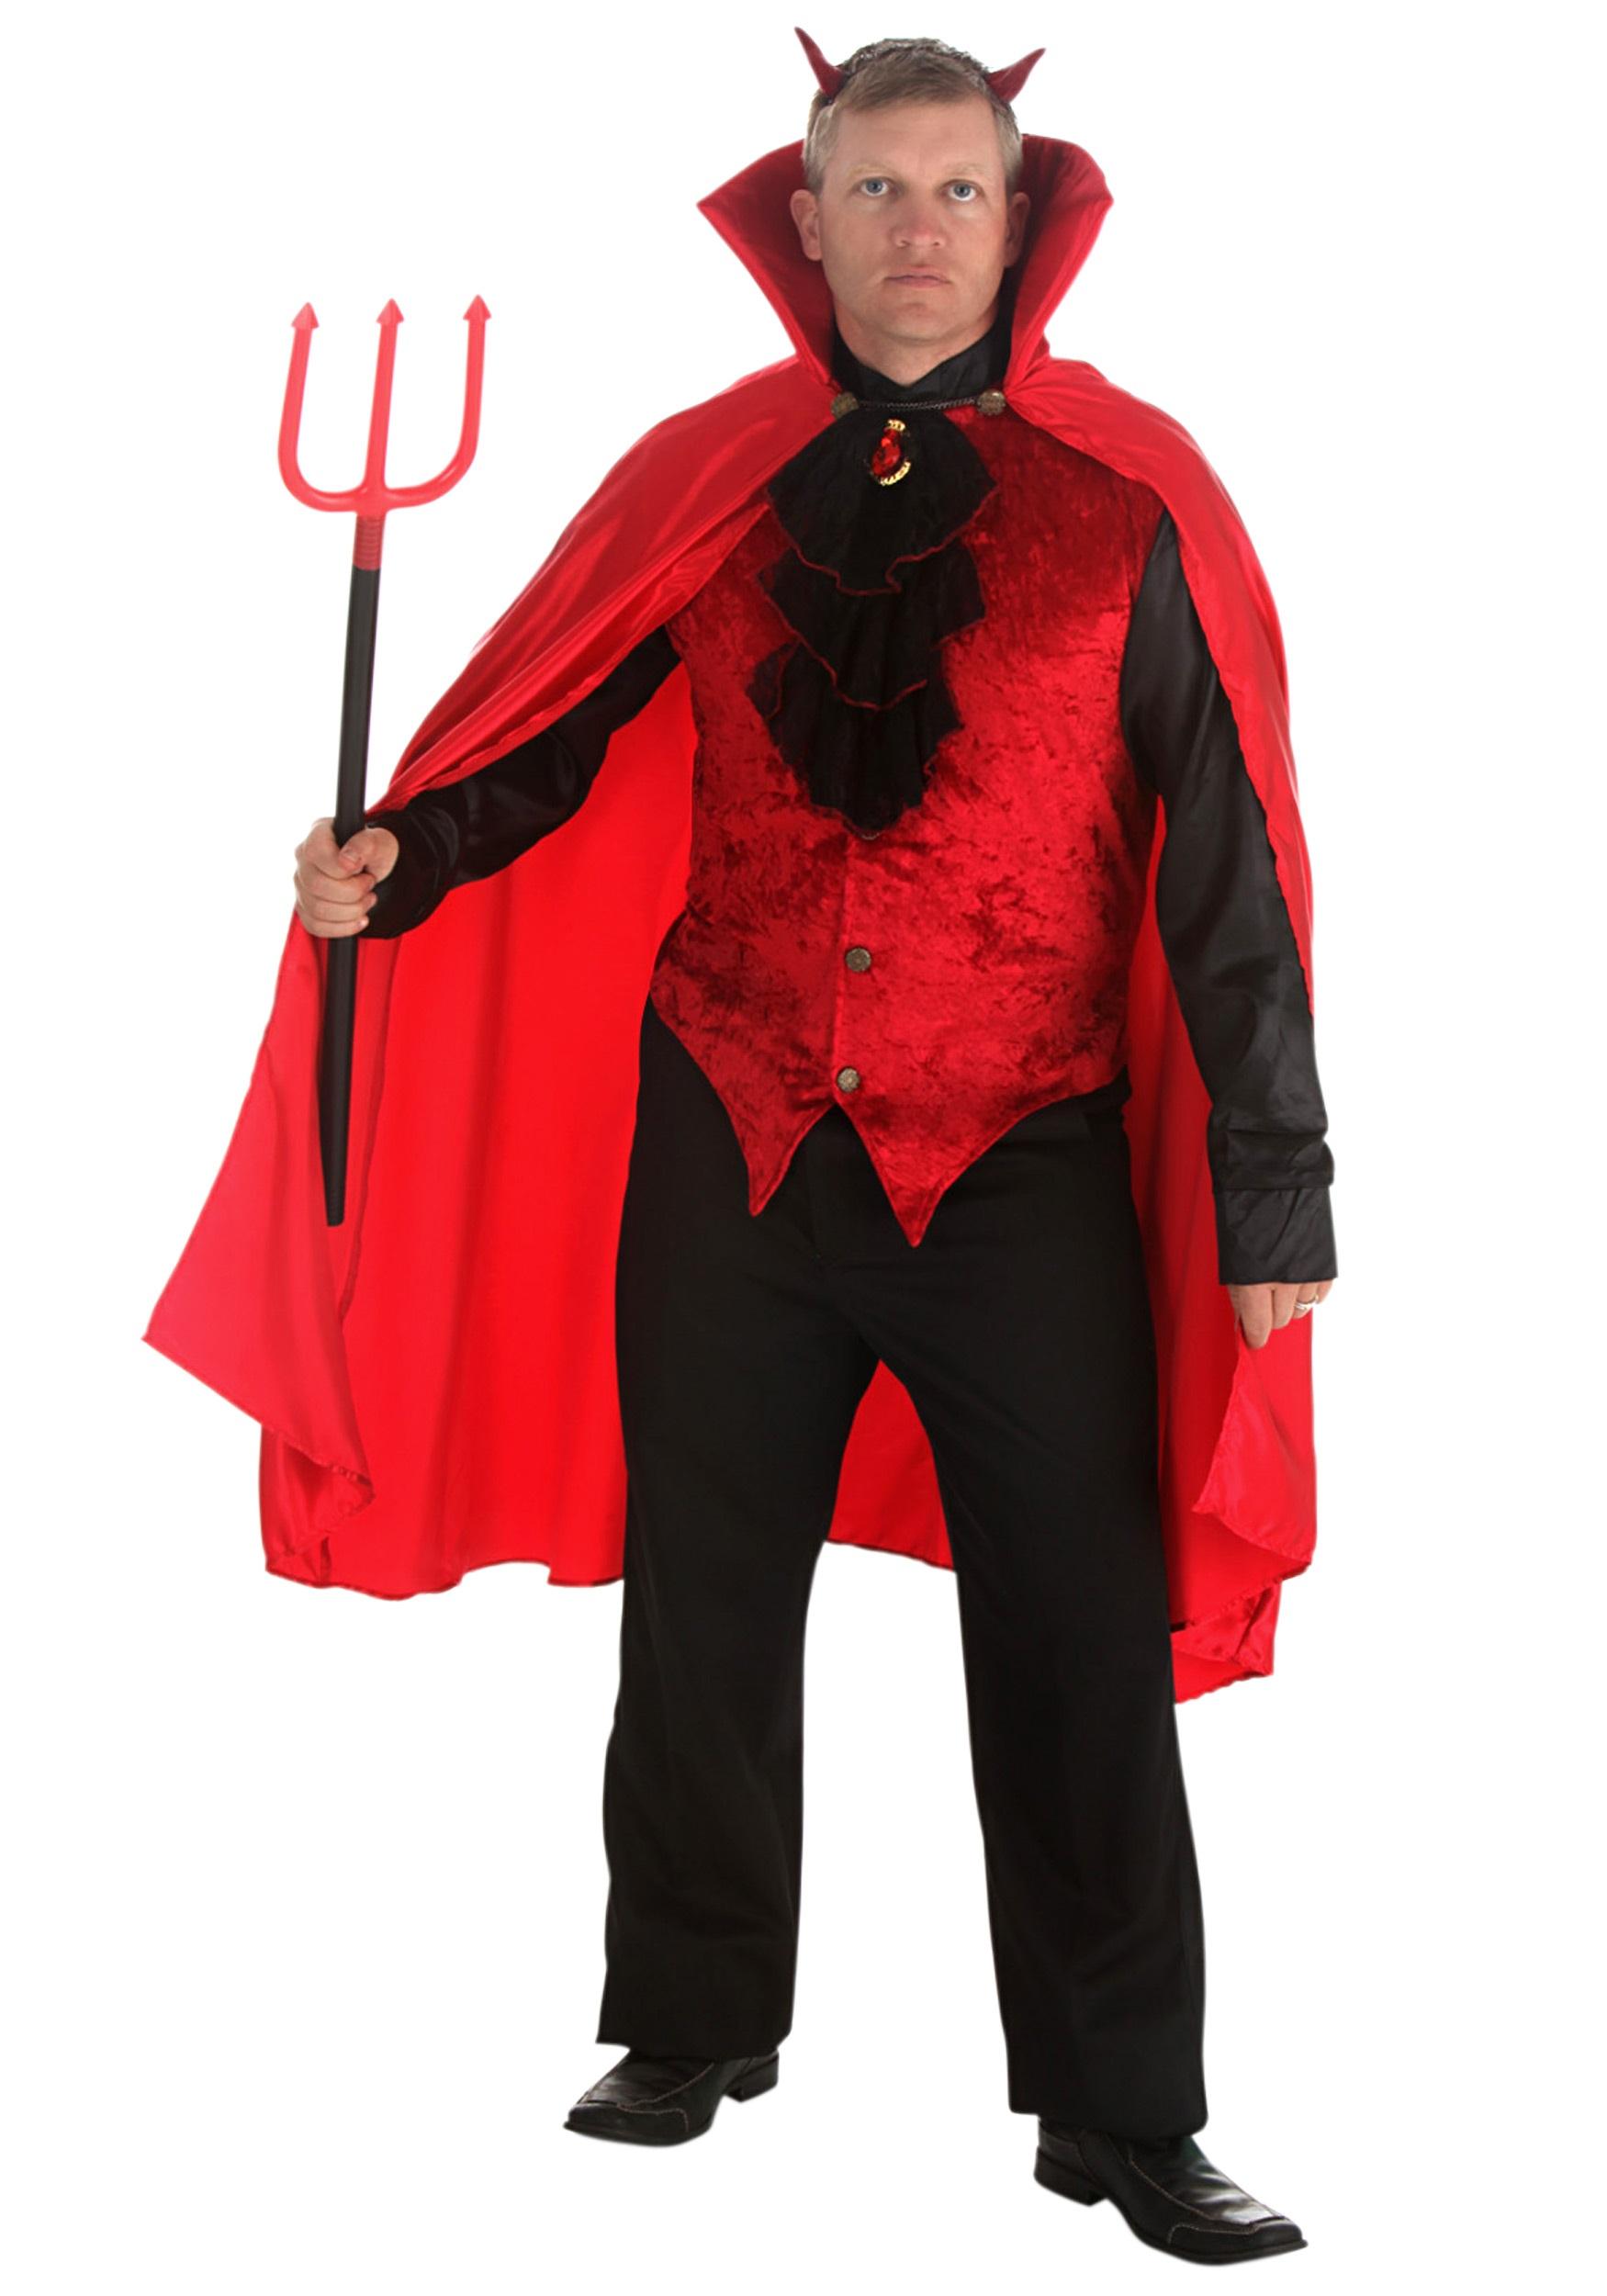 Plus Size Elite Devil Costume - Halloween Costume Ideas 2019